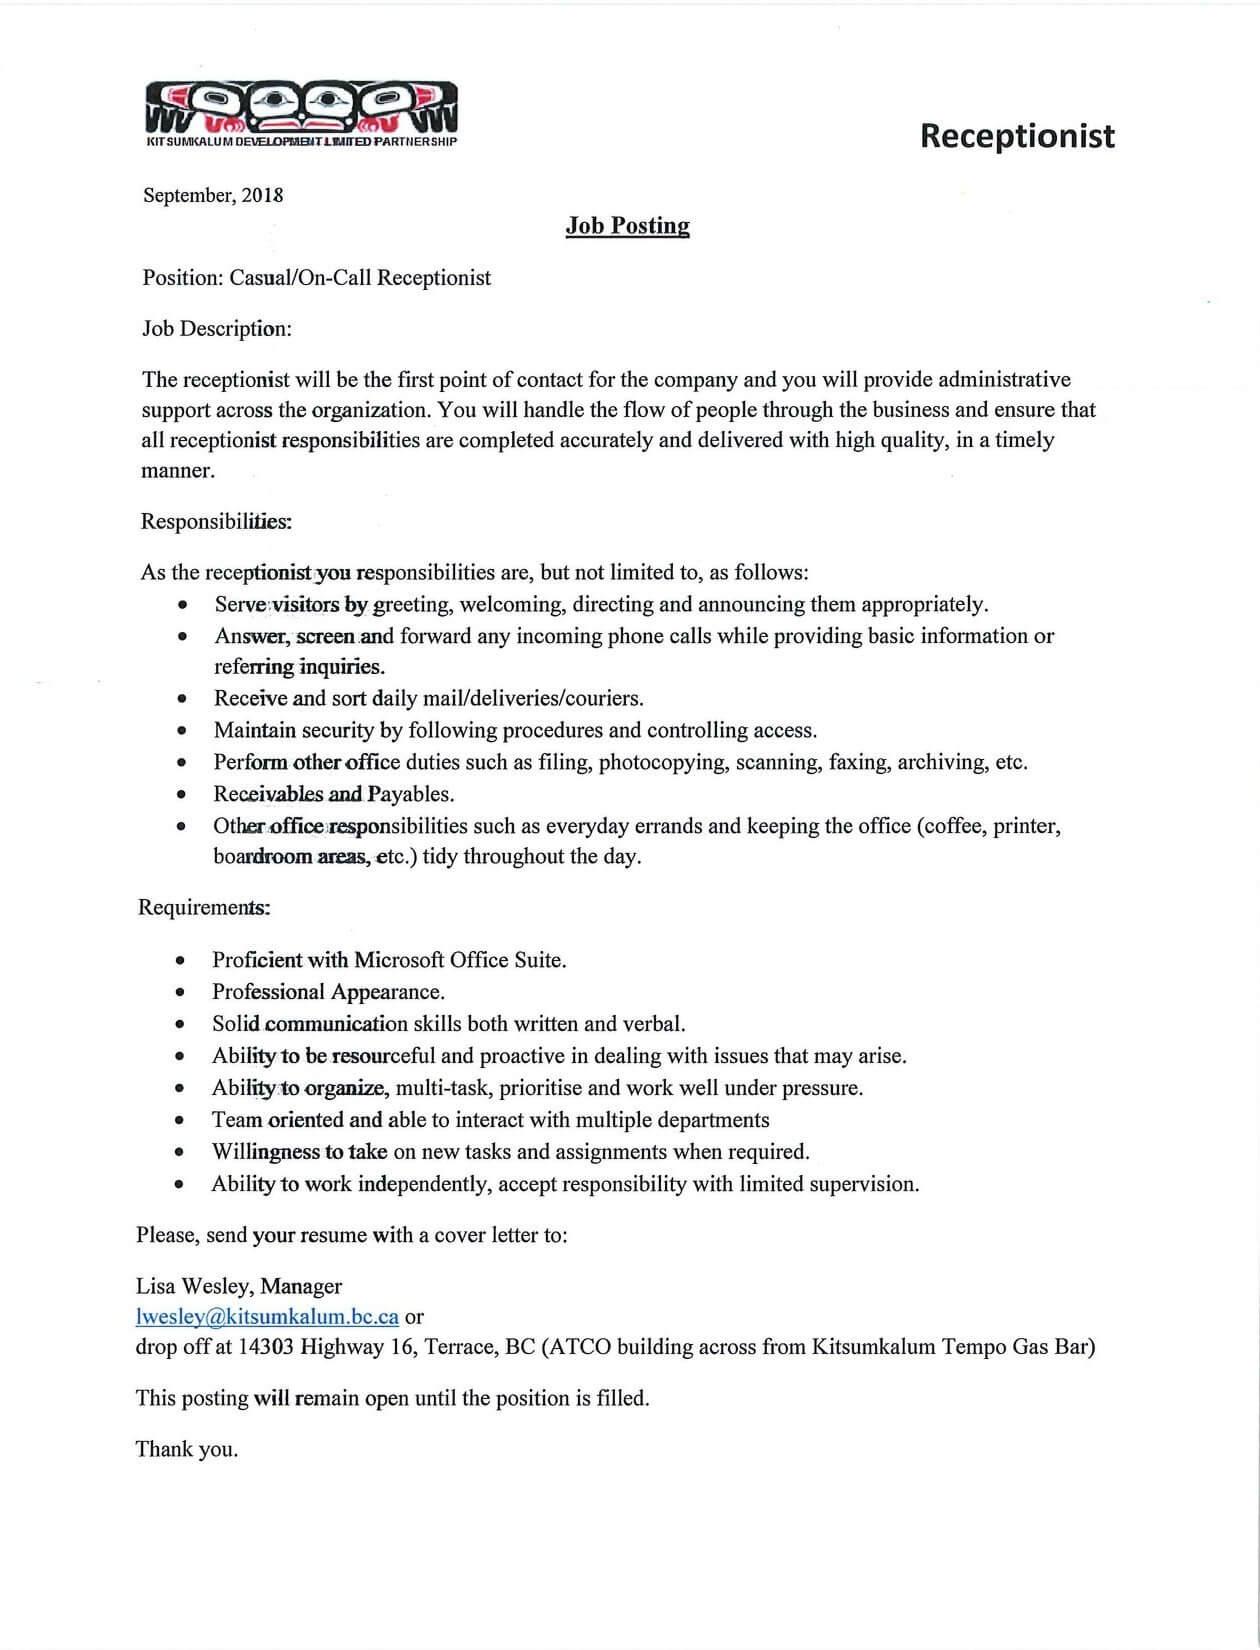 Receptionist Job Posting | Kitsumkalum, a Galts\'ap (community) of ...